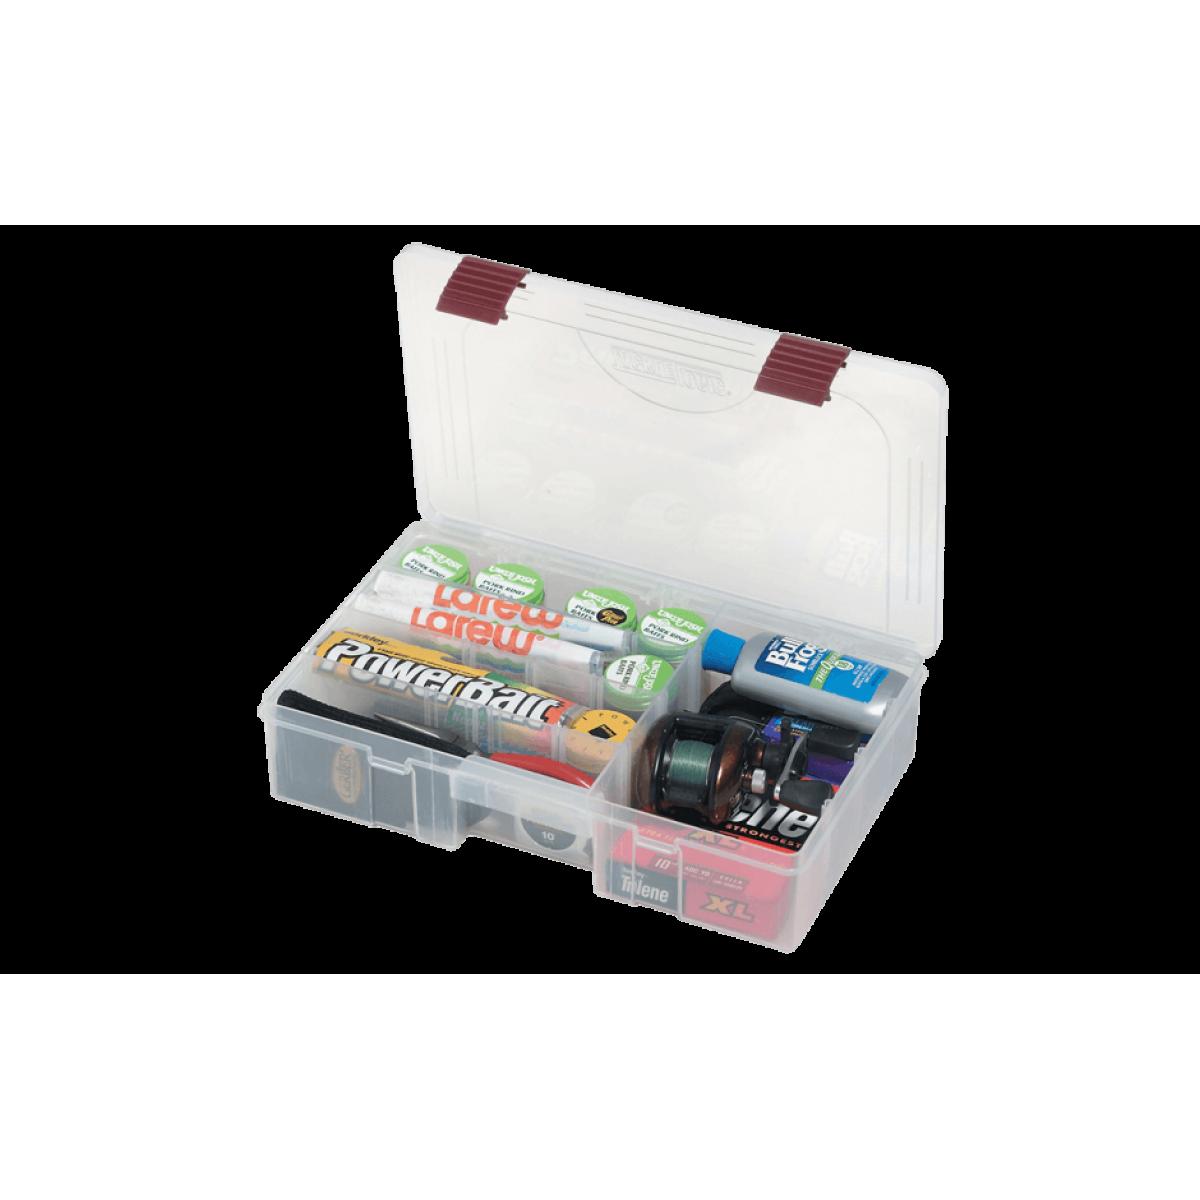 Коробка Plano 2-3780-00 для приманок, 5-21 отсеков цена и фото